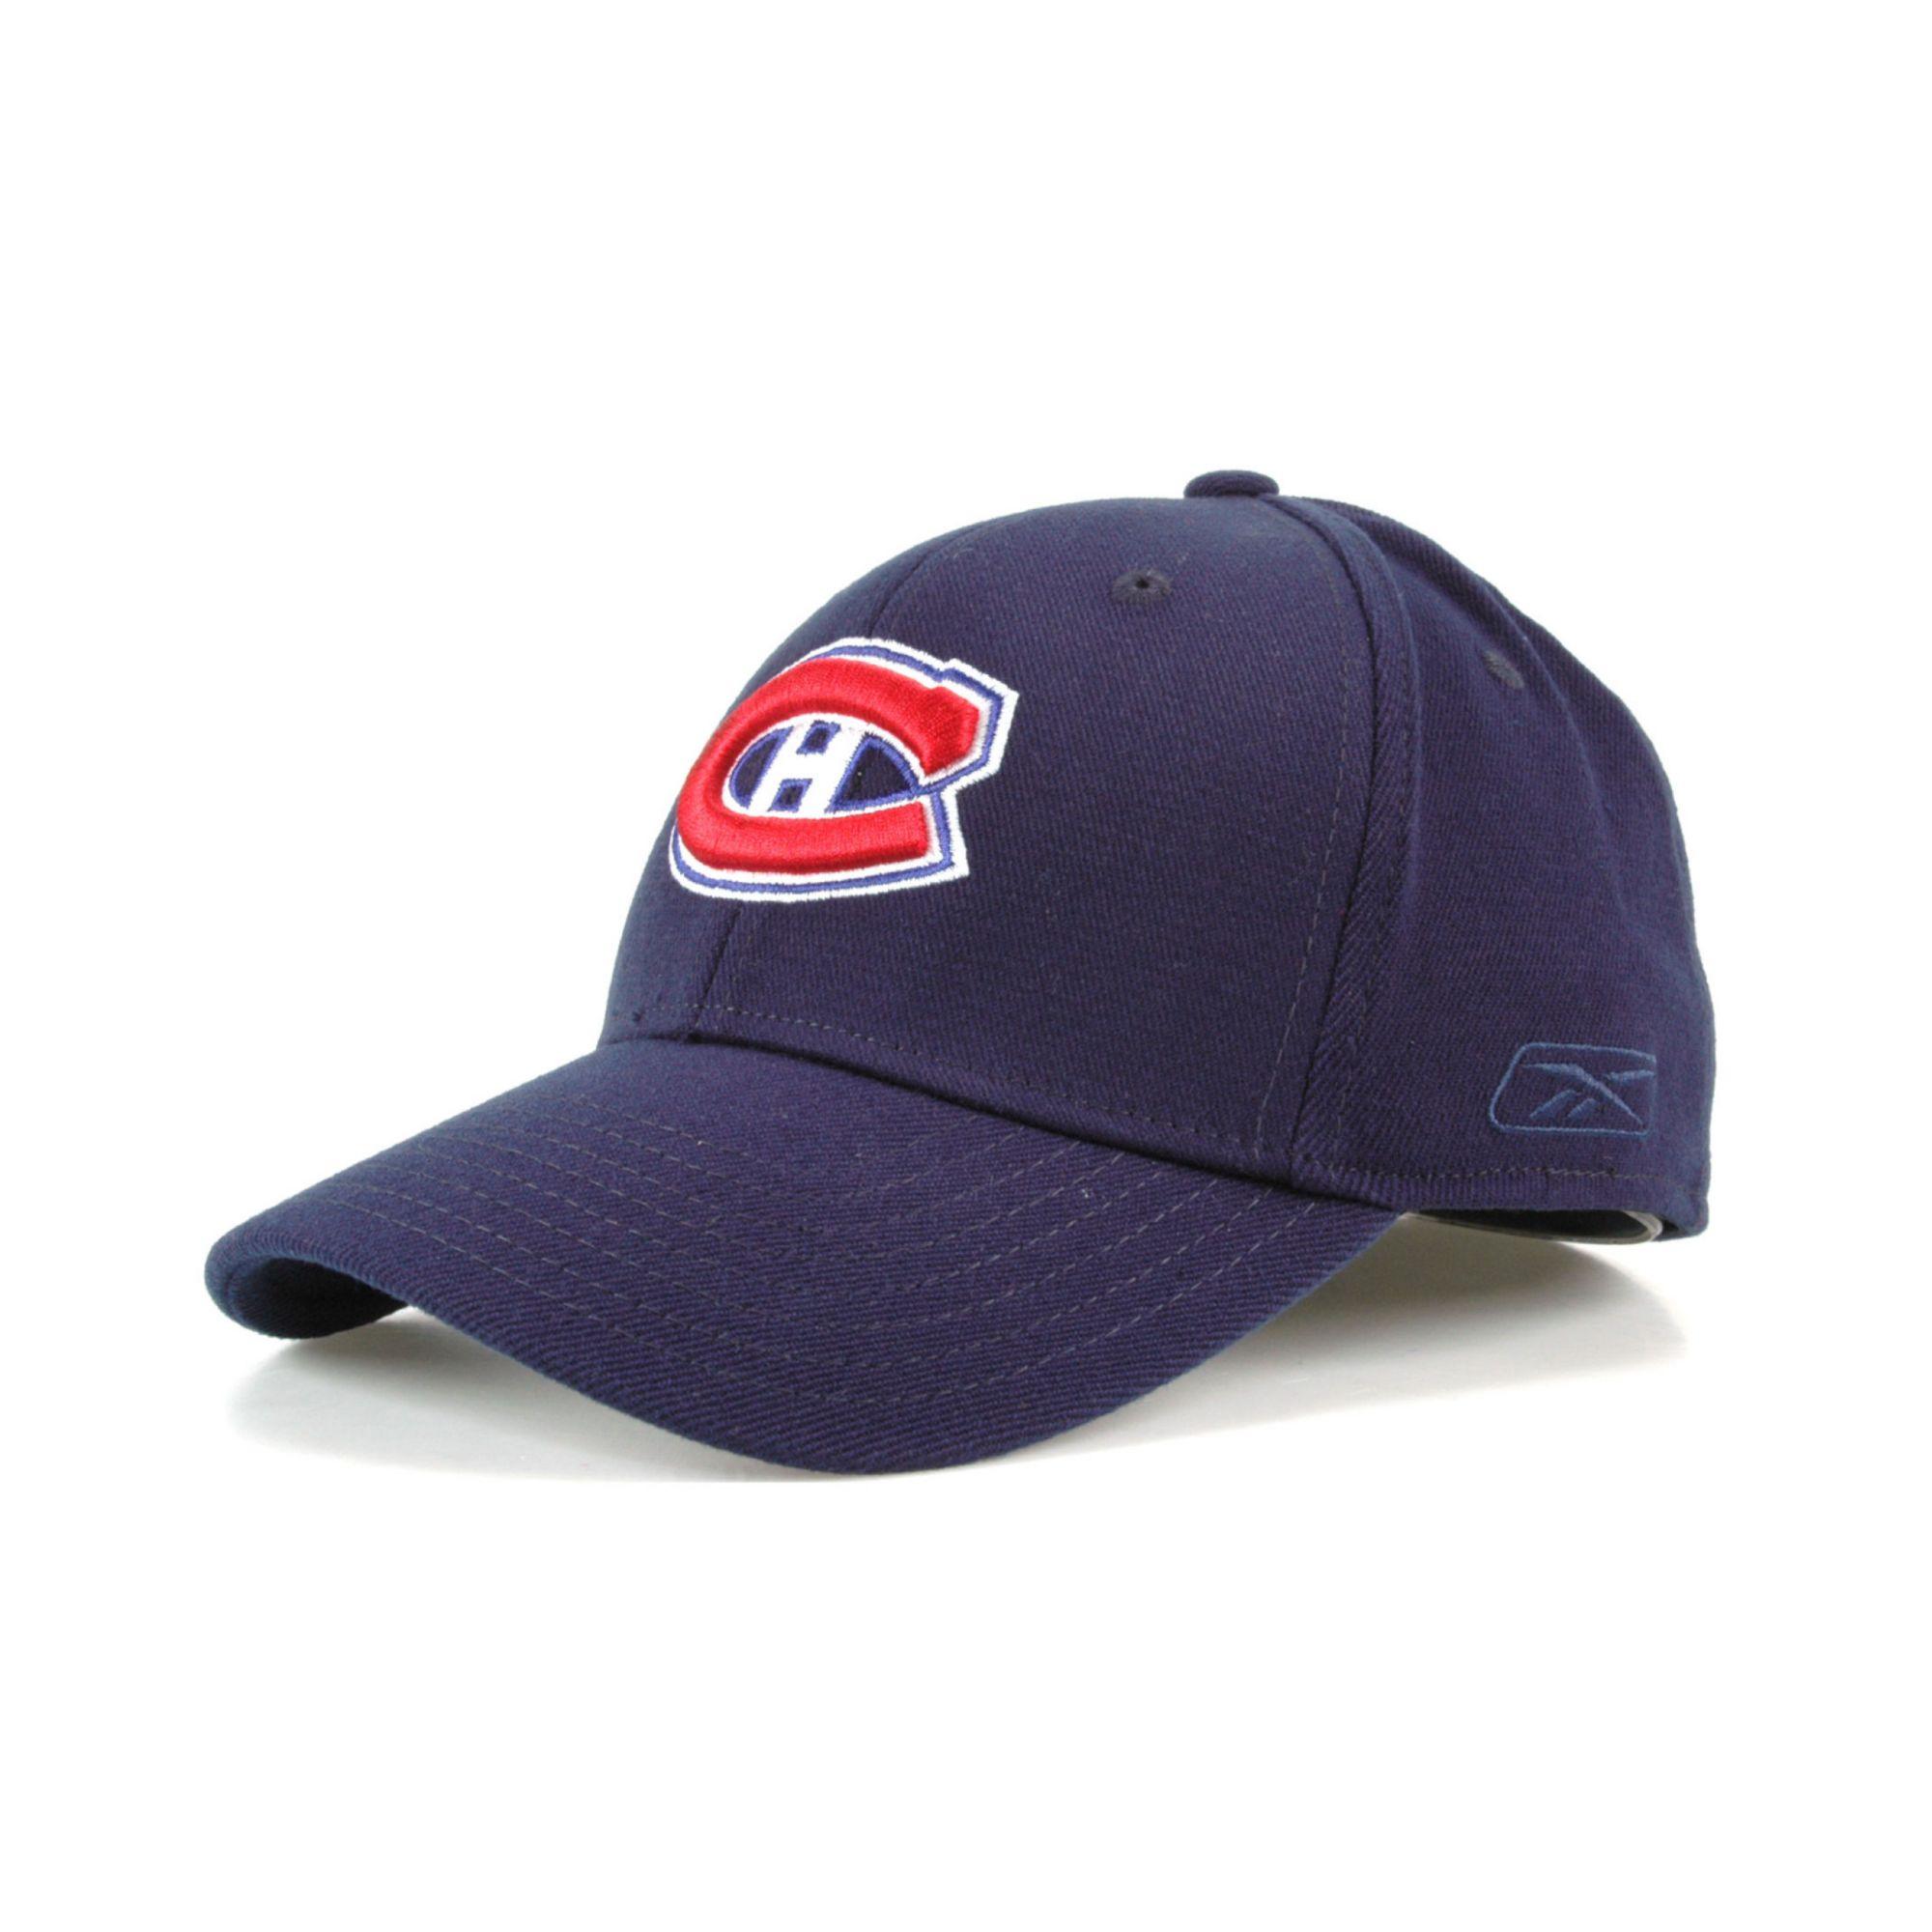 new products 7a94c 14dea Reebok Blue Montreal Canadiens Hat Trick Cap for men